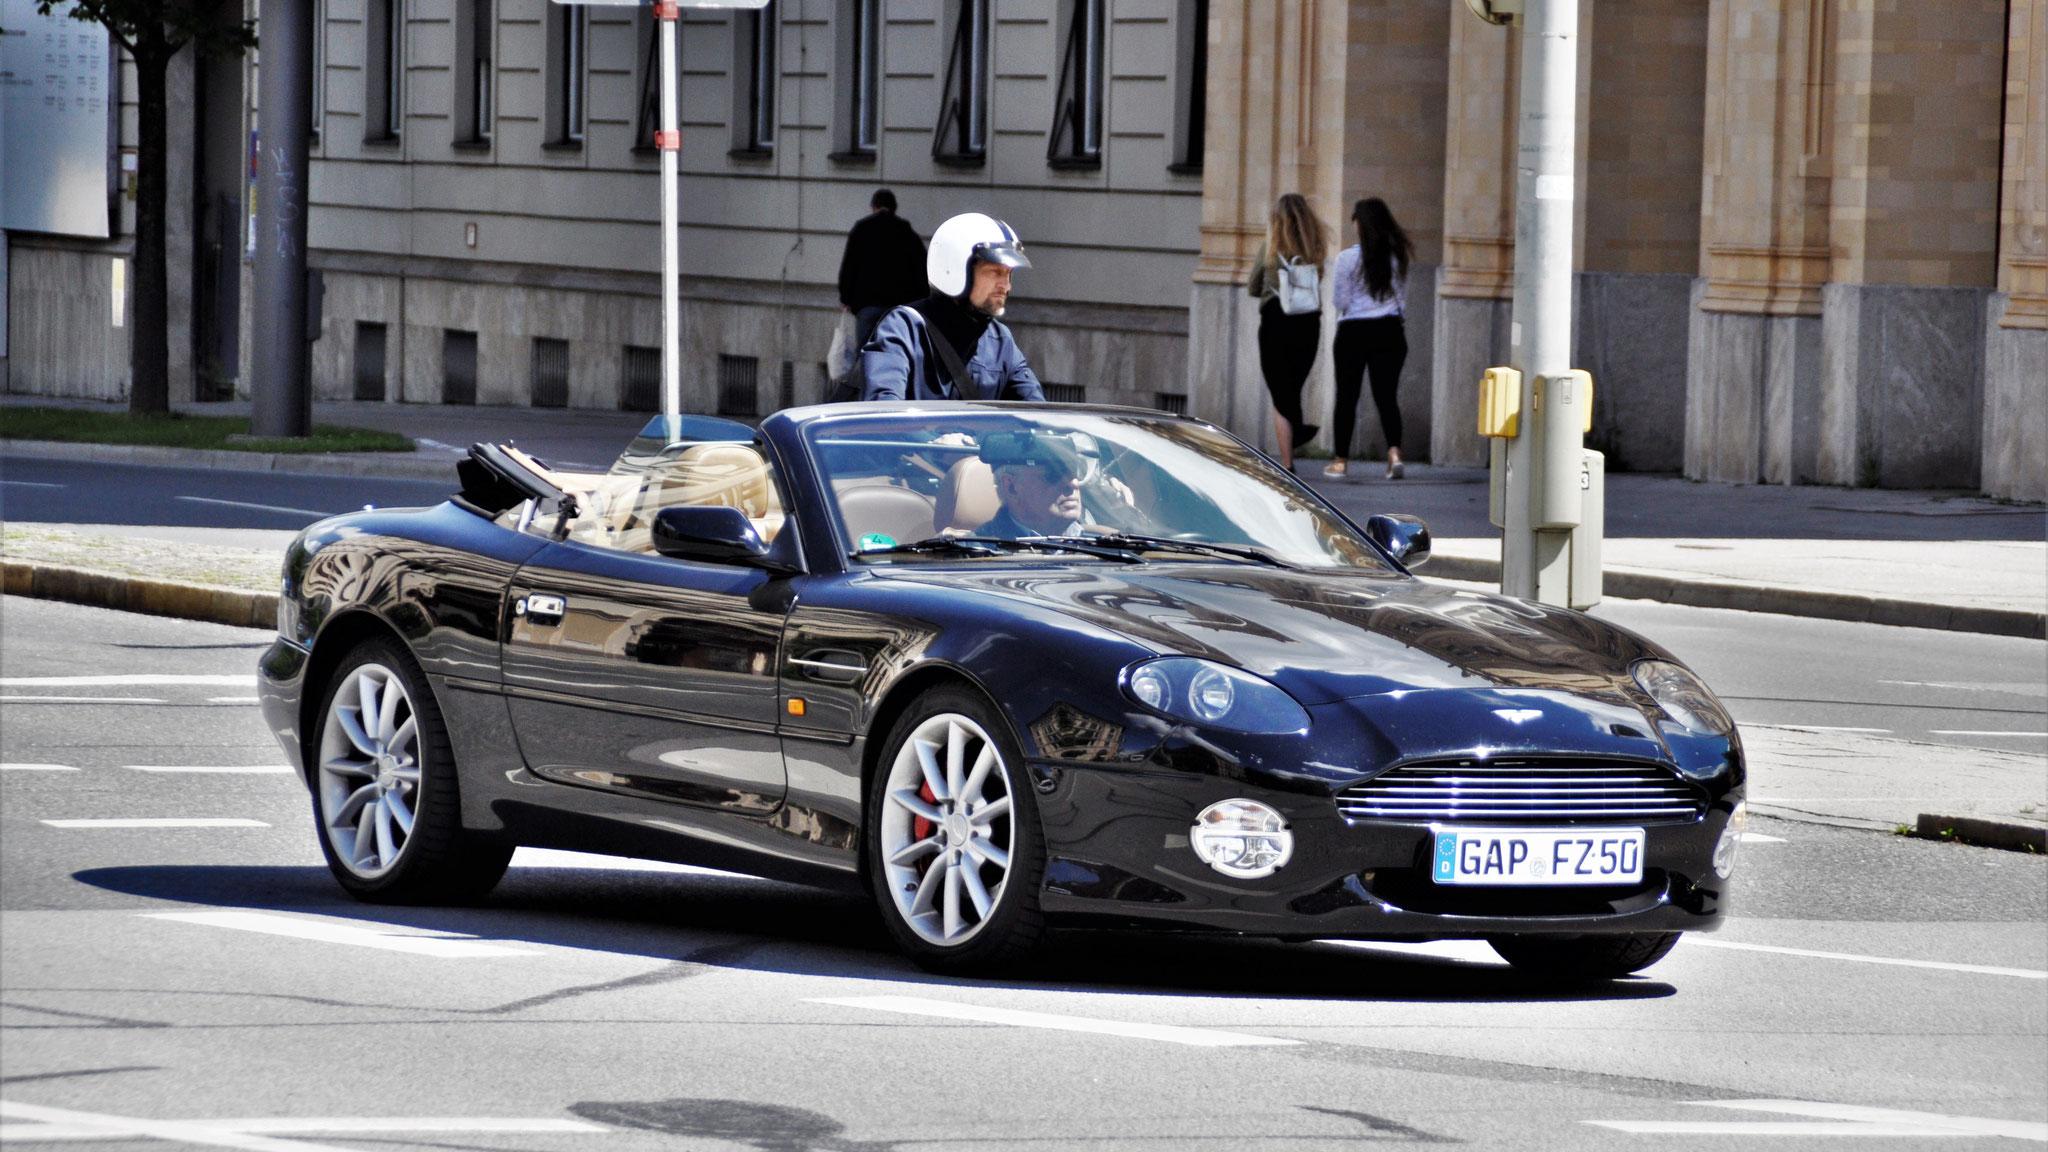 Aston Martin DB7 Volante - GAP-FZ-50